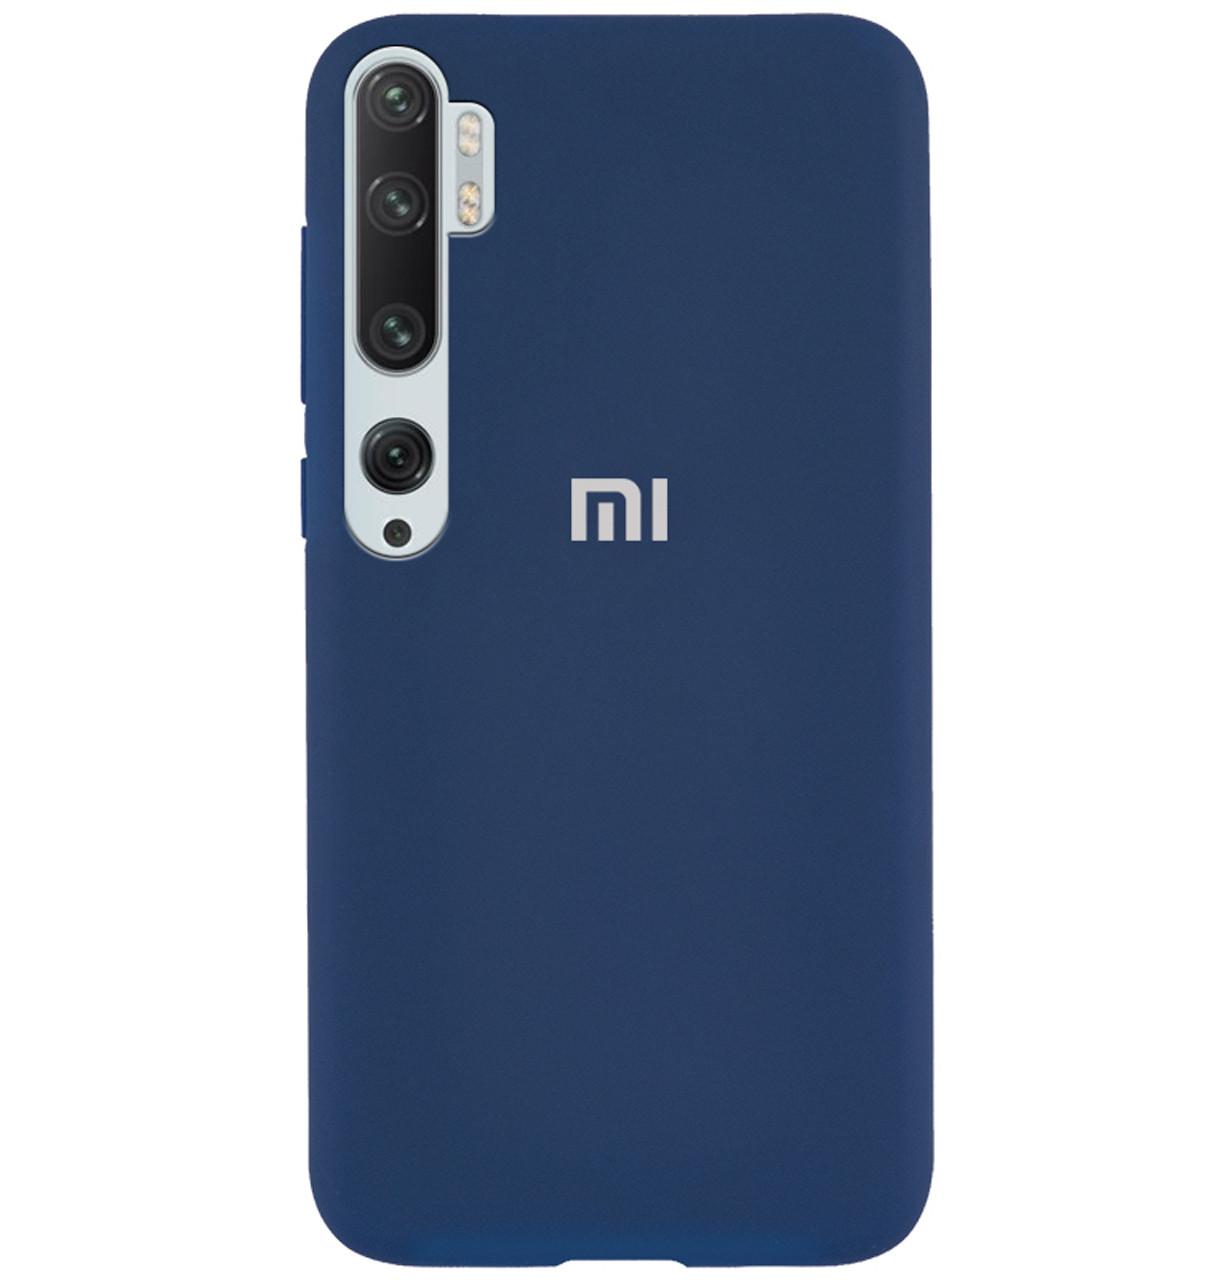 Чехол-накладка Original Silicone case Full Protective на Xiaomi Mi Note 10 / Note 10 Pro / CC9 Pro #1 Navy Blue